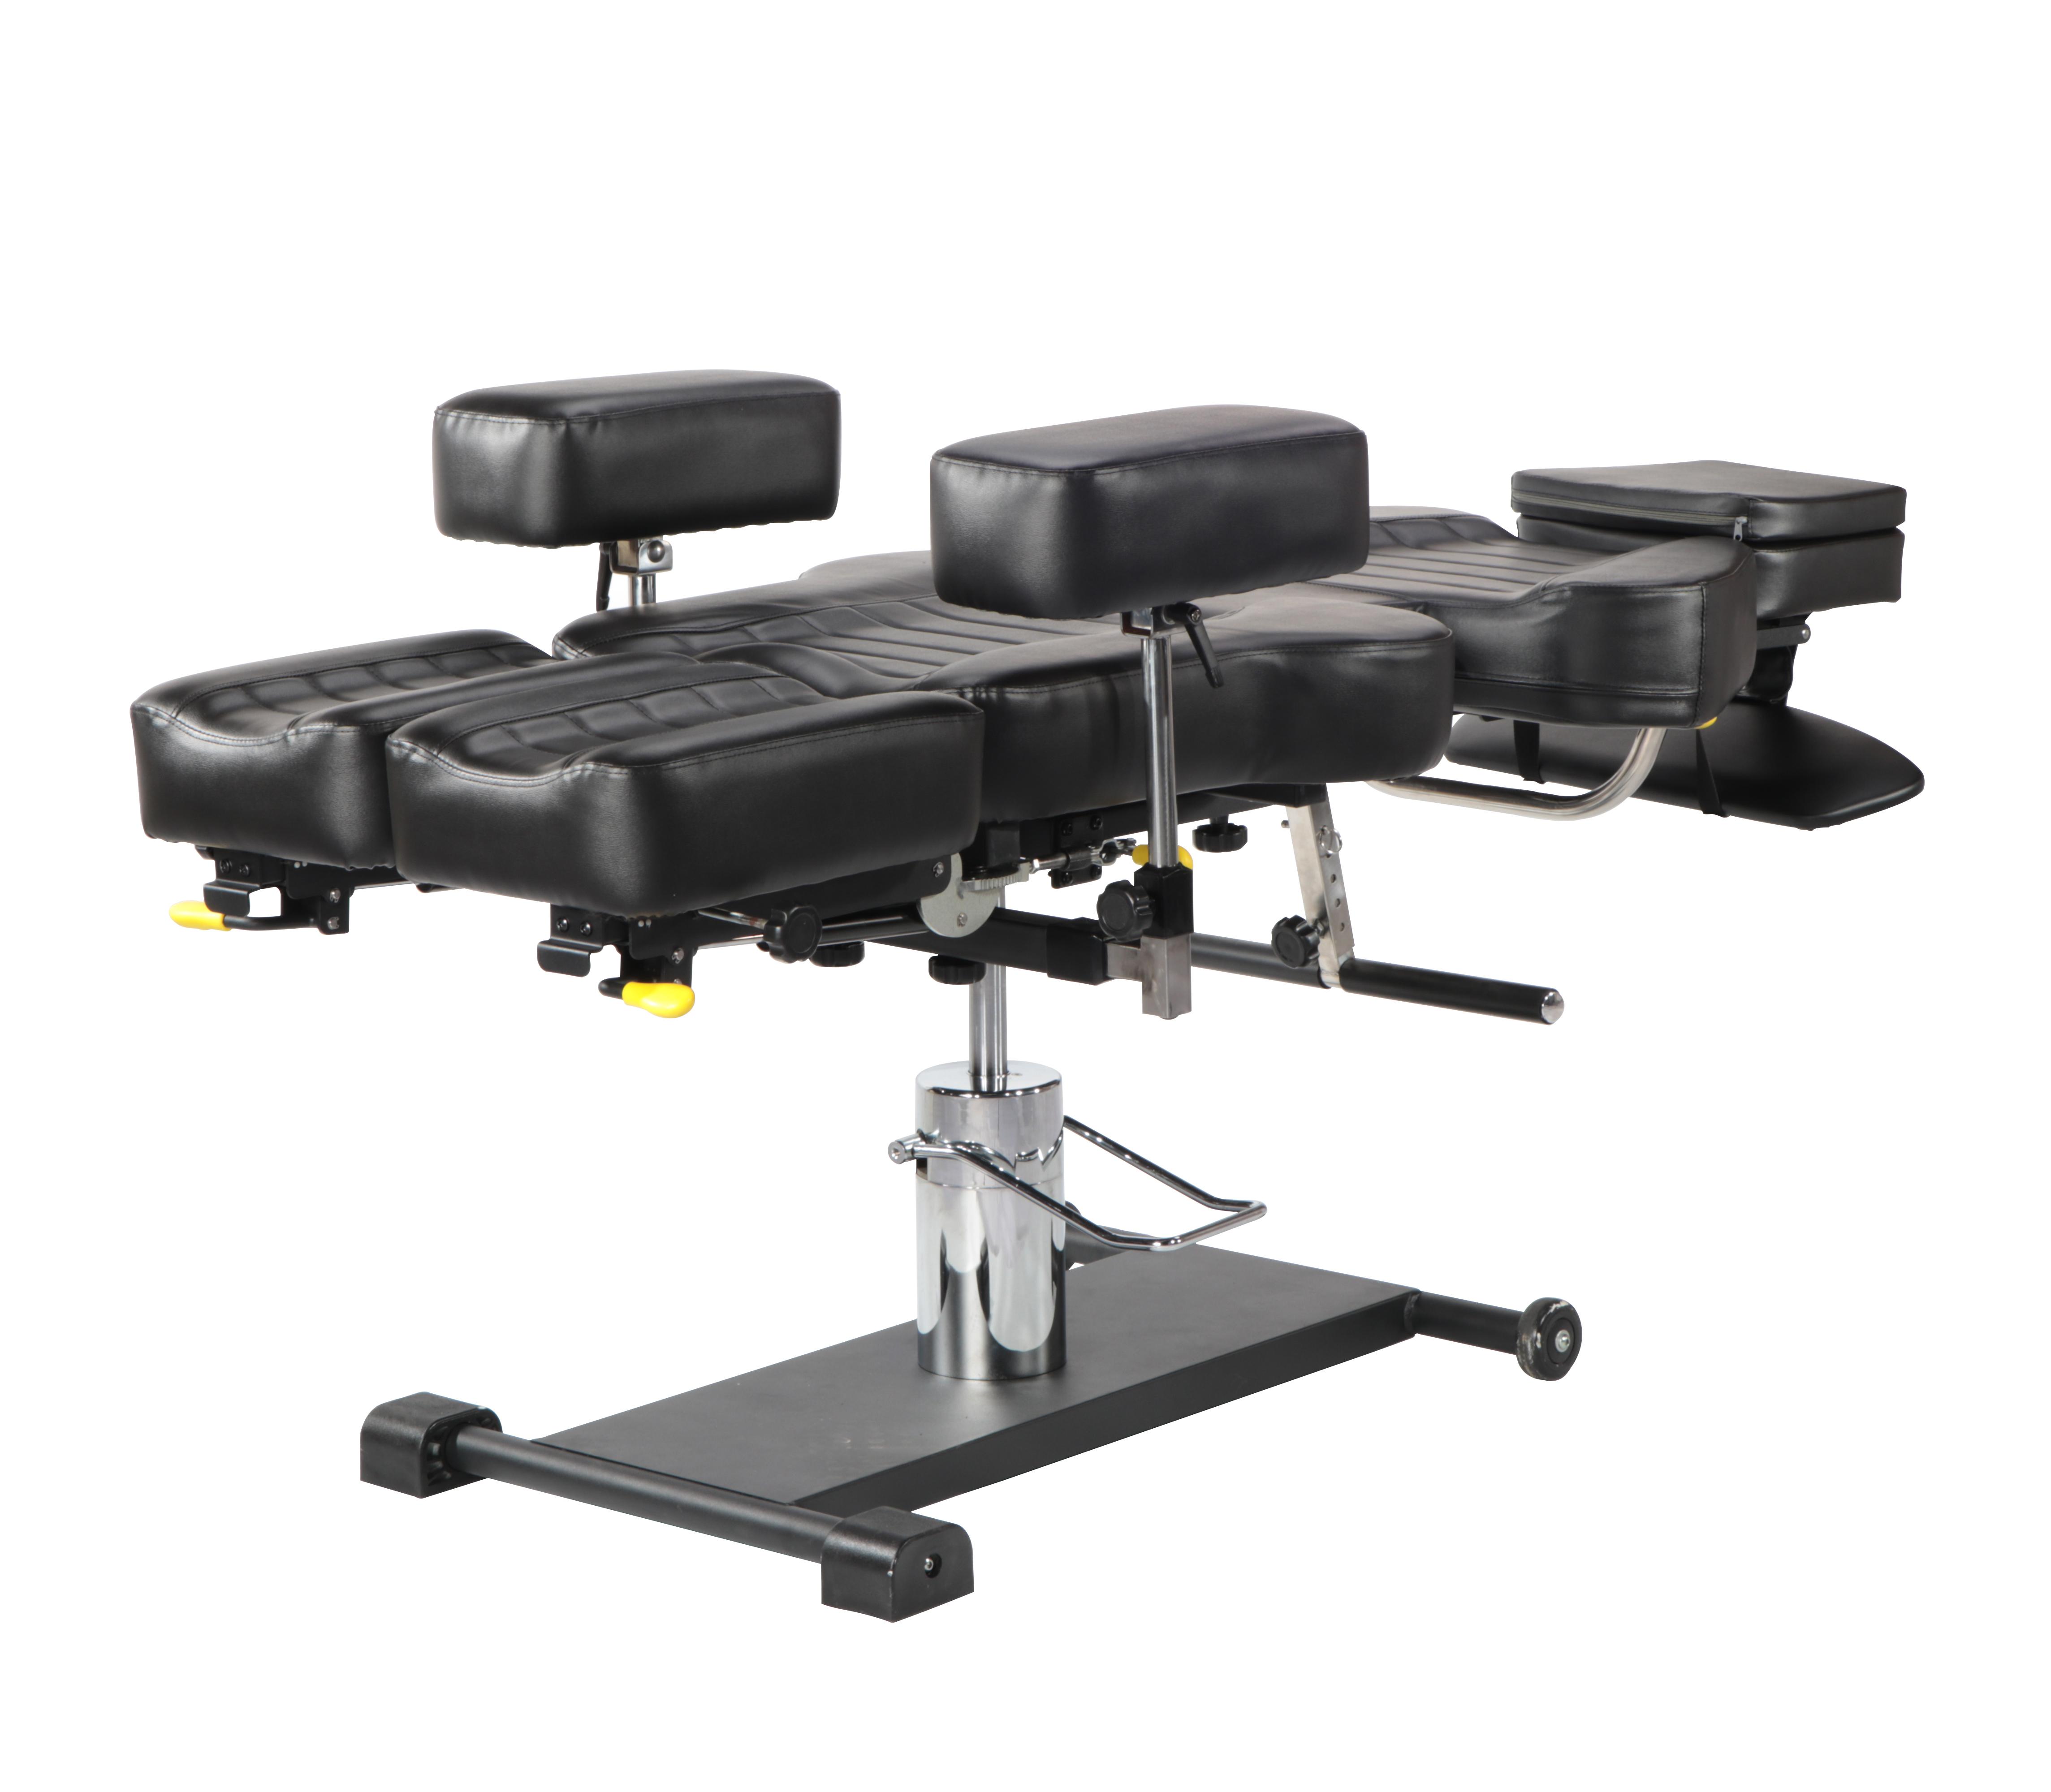 Adjustable Tattoo Chair Tattoo Supplies Bed hydraulic Cosmetic tattoo chair